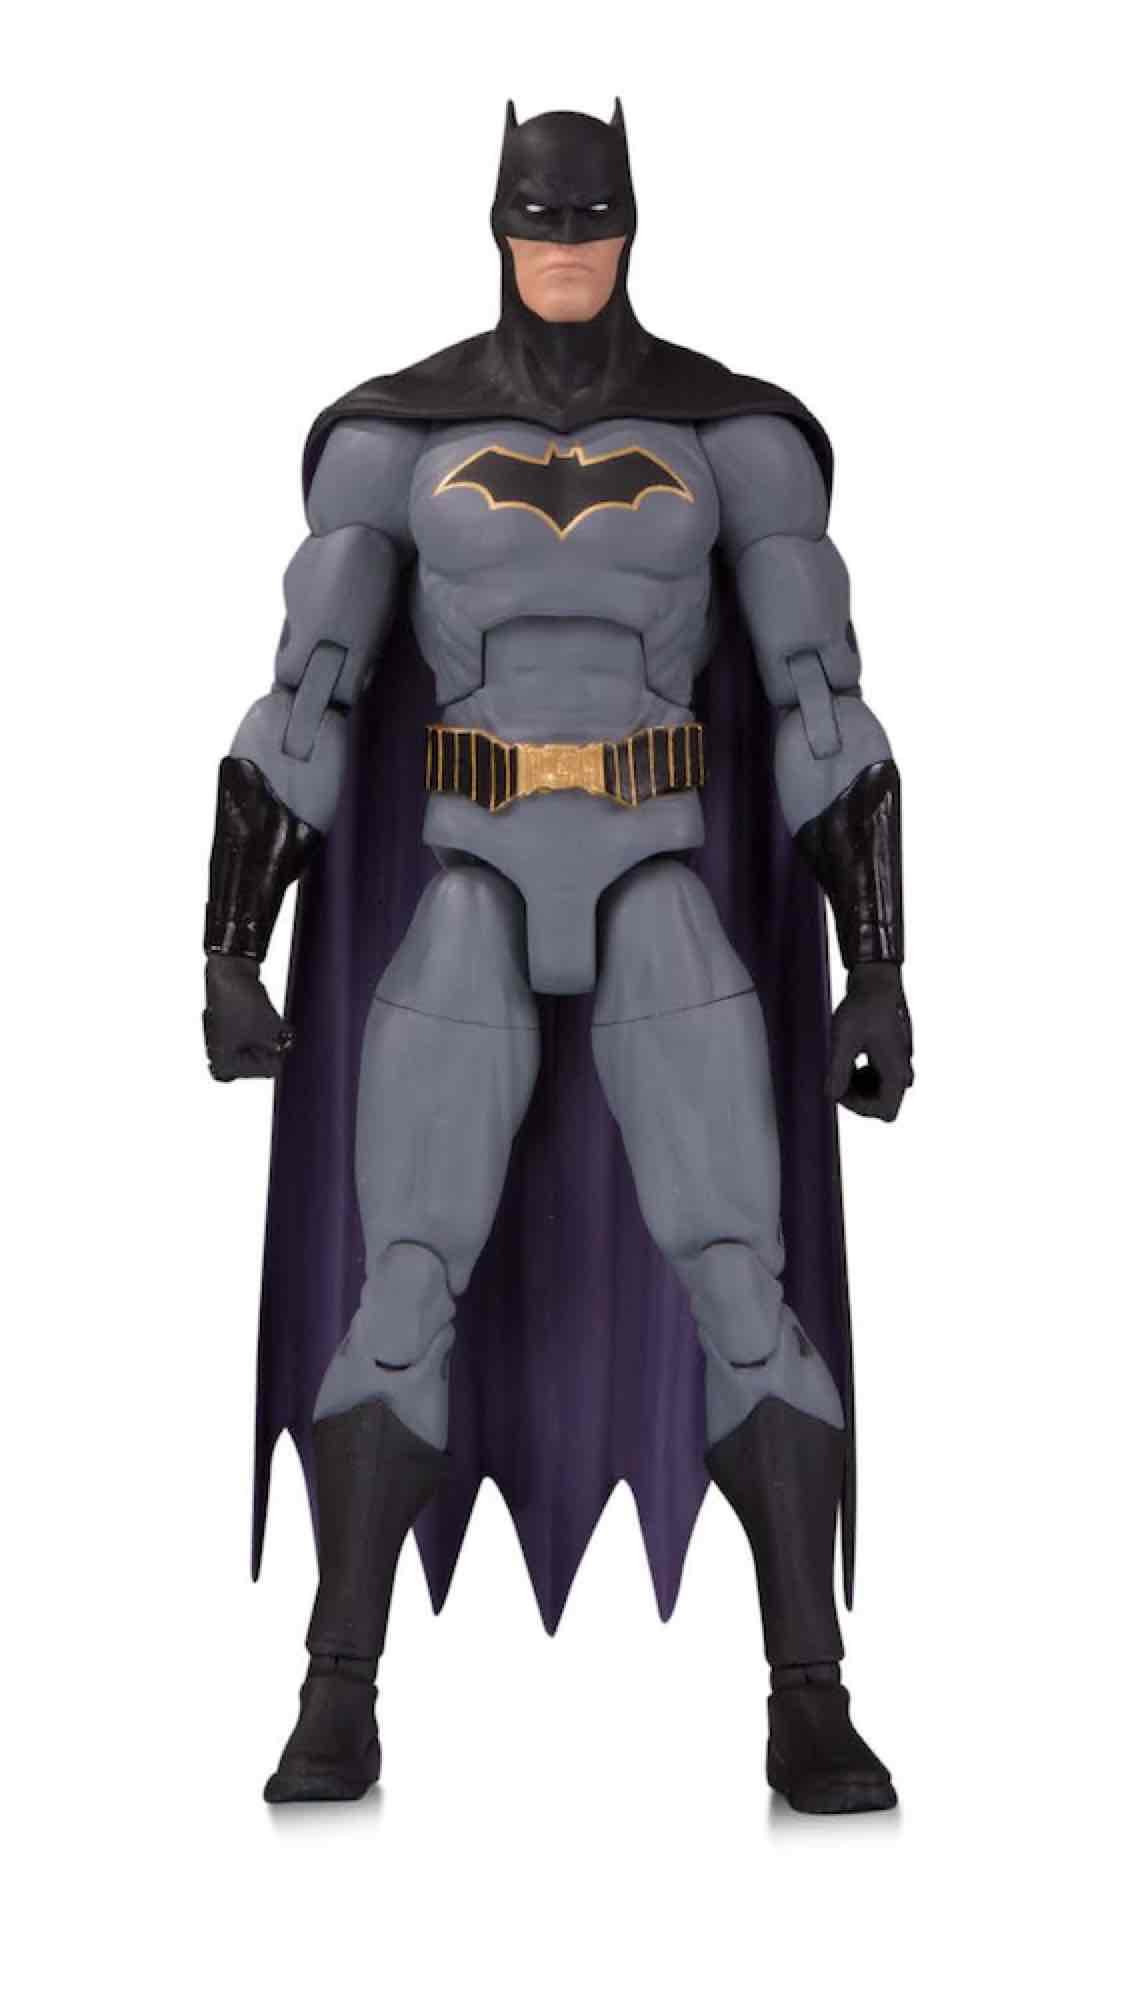 BATMAN REBIRTH VERSION 2 FIGURA 18 CM ACTION FIGURE BATMAN DC ESSENTIALS